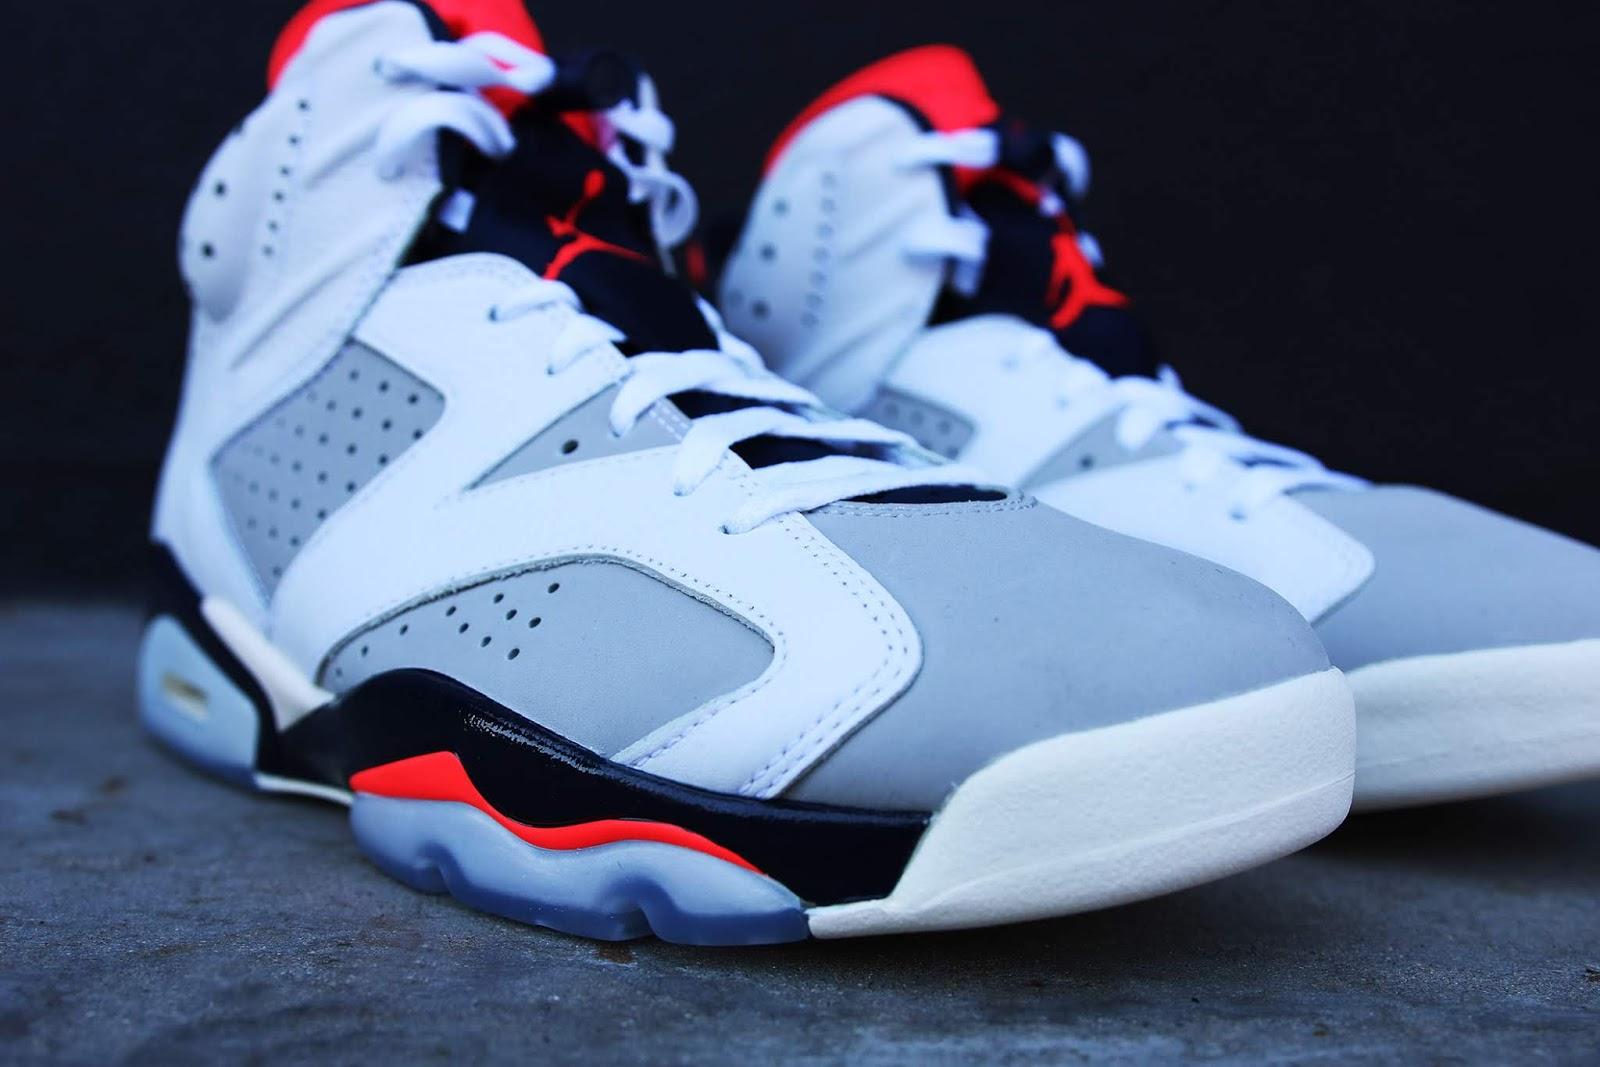 Swag Craze  First Look  Nike Air Jordan 6  Tinker Hatfield  a61df21c9